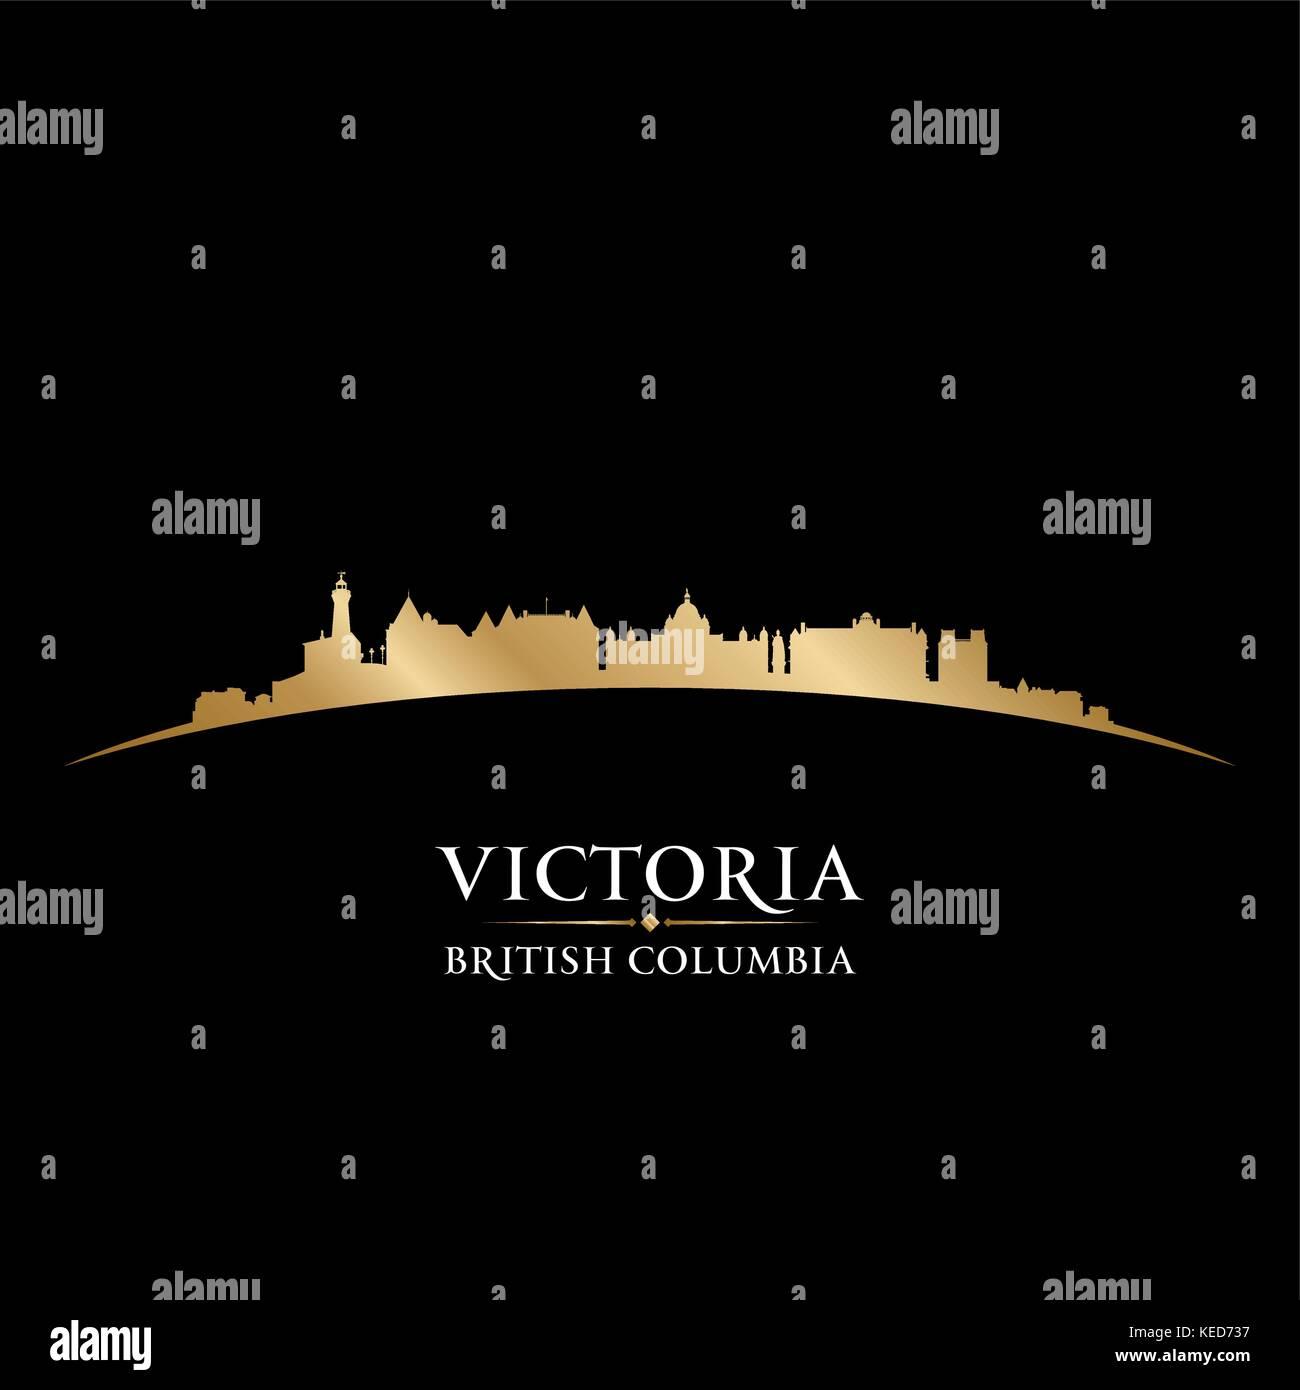 Victoria British Columbia Canada city skyline silhouette. Vector illustration - Stock Image